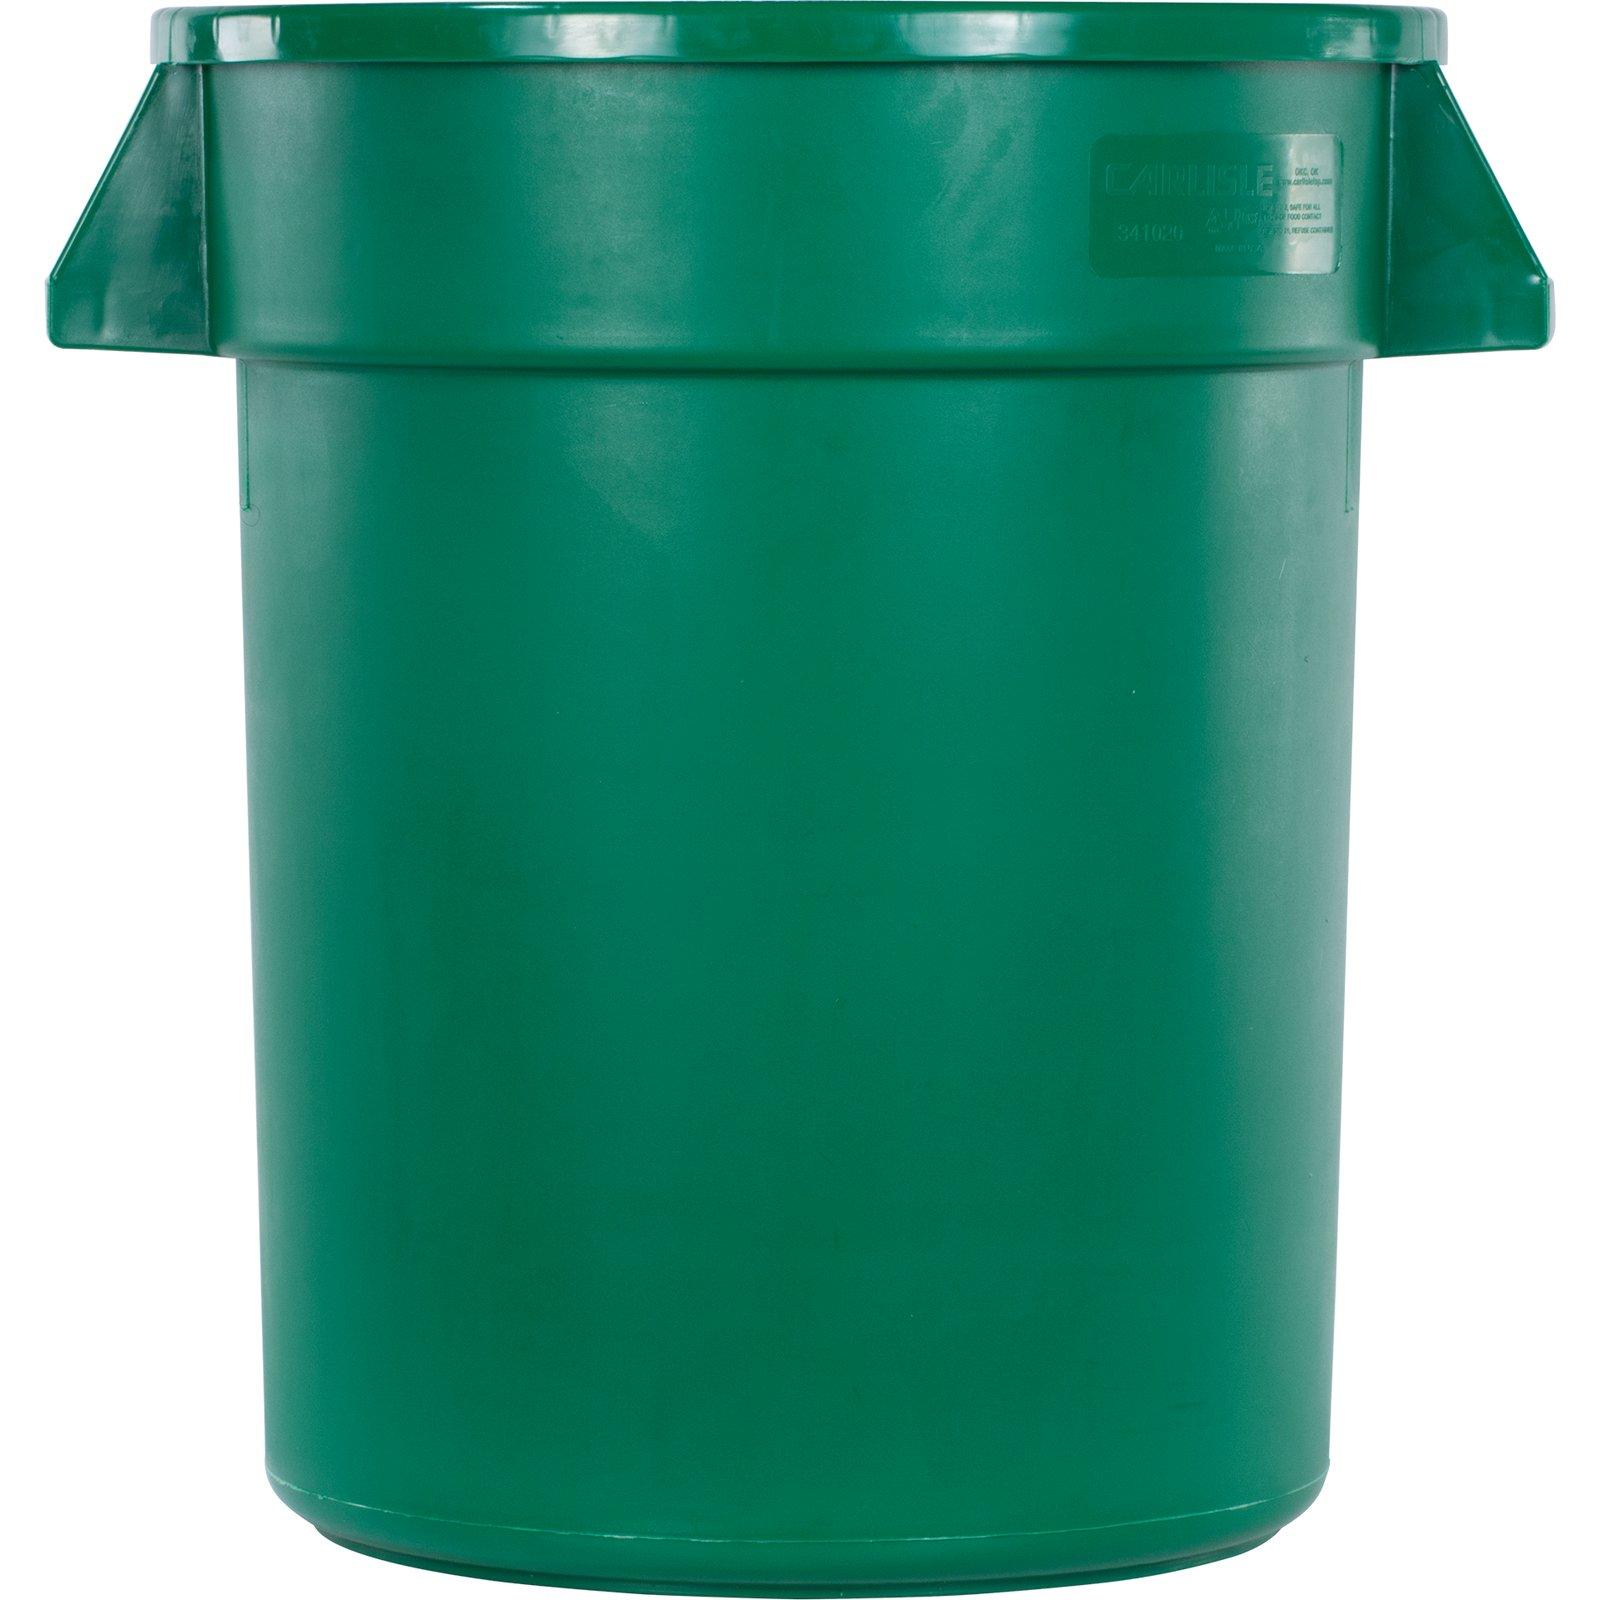 34102009 - Bronco™ Round Waste Bin Food Container 20 Gallon - Green ...